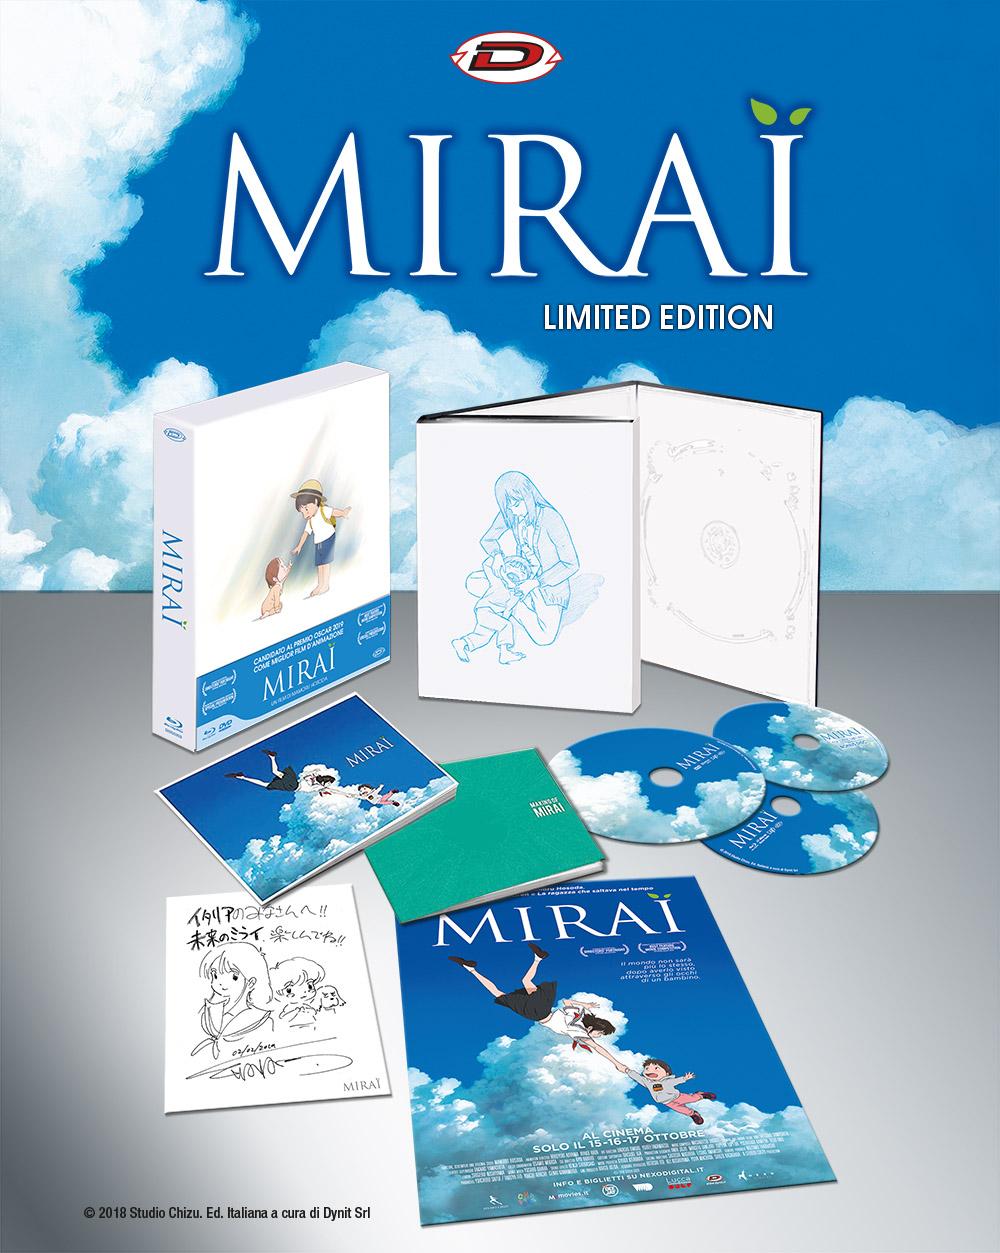 COF.MIRAI (LIMITED EDITION DIGIPACK BOX) (2 BLU-RAY+DVD+2 BOOKLE